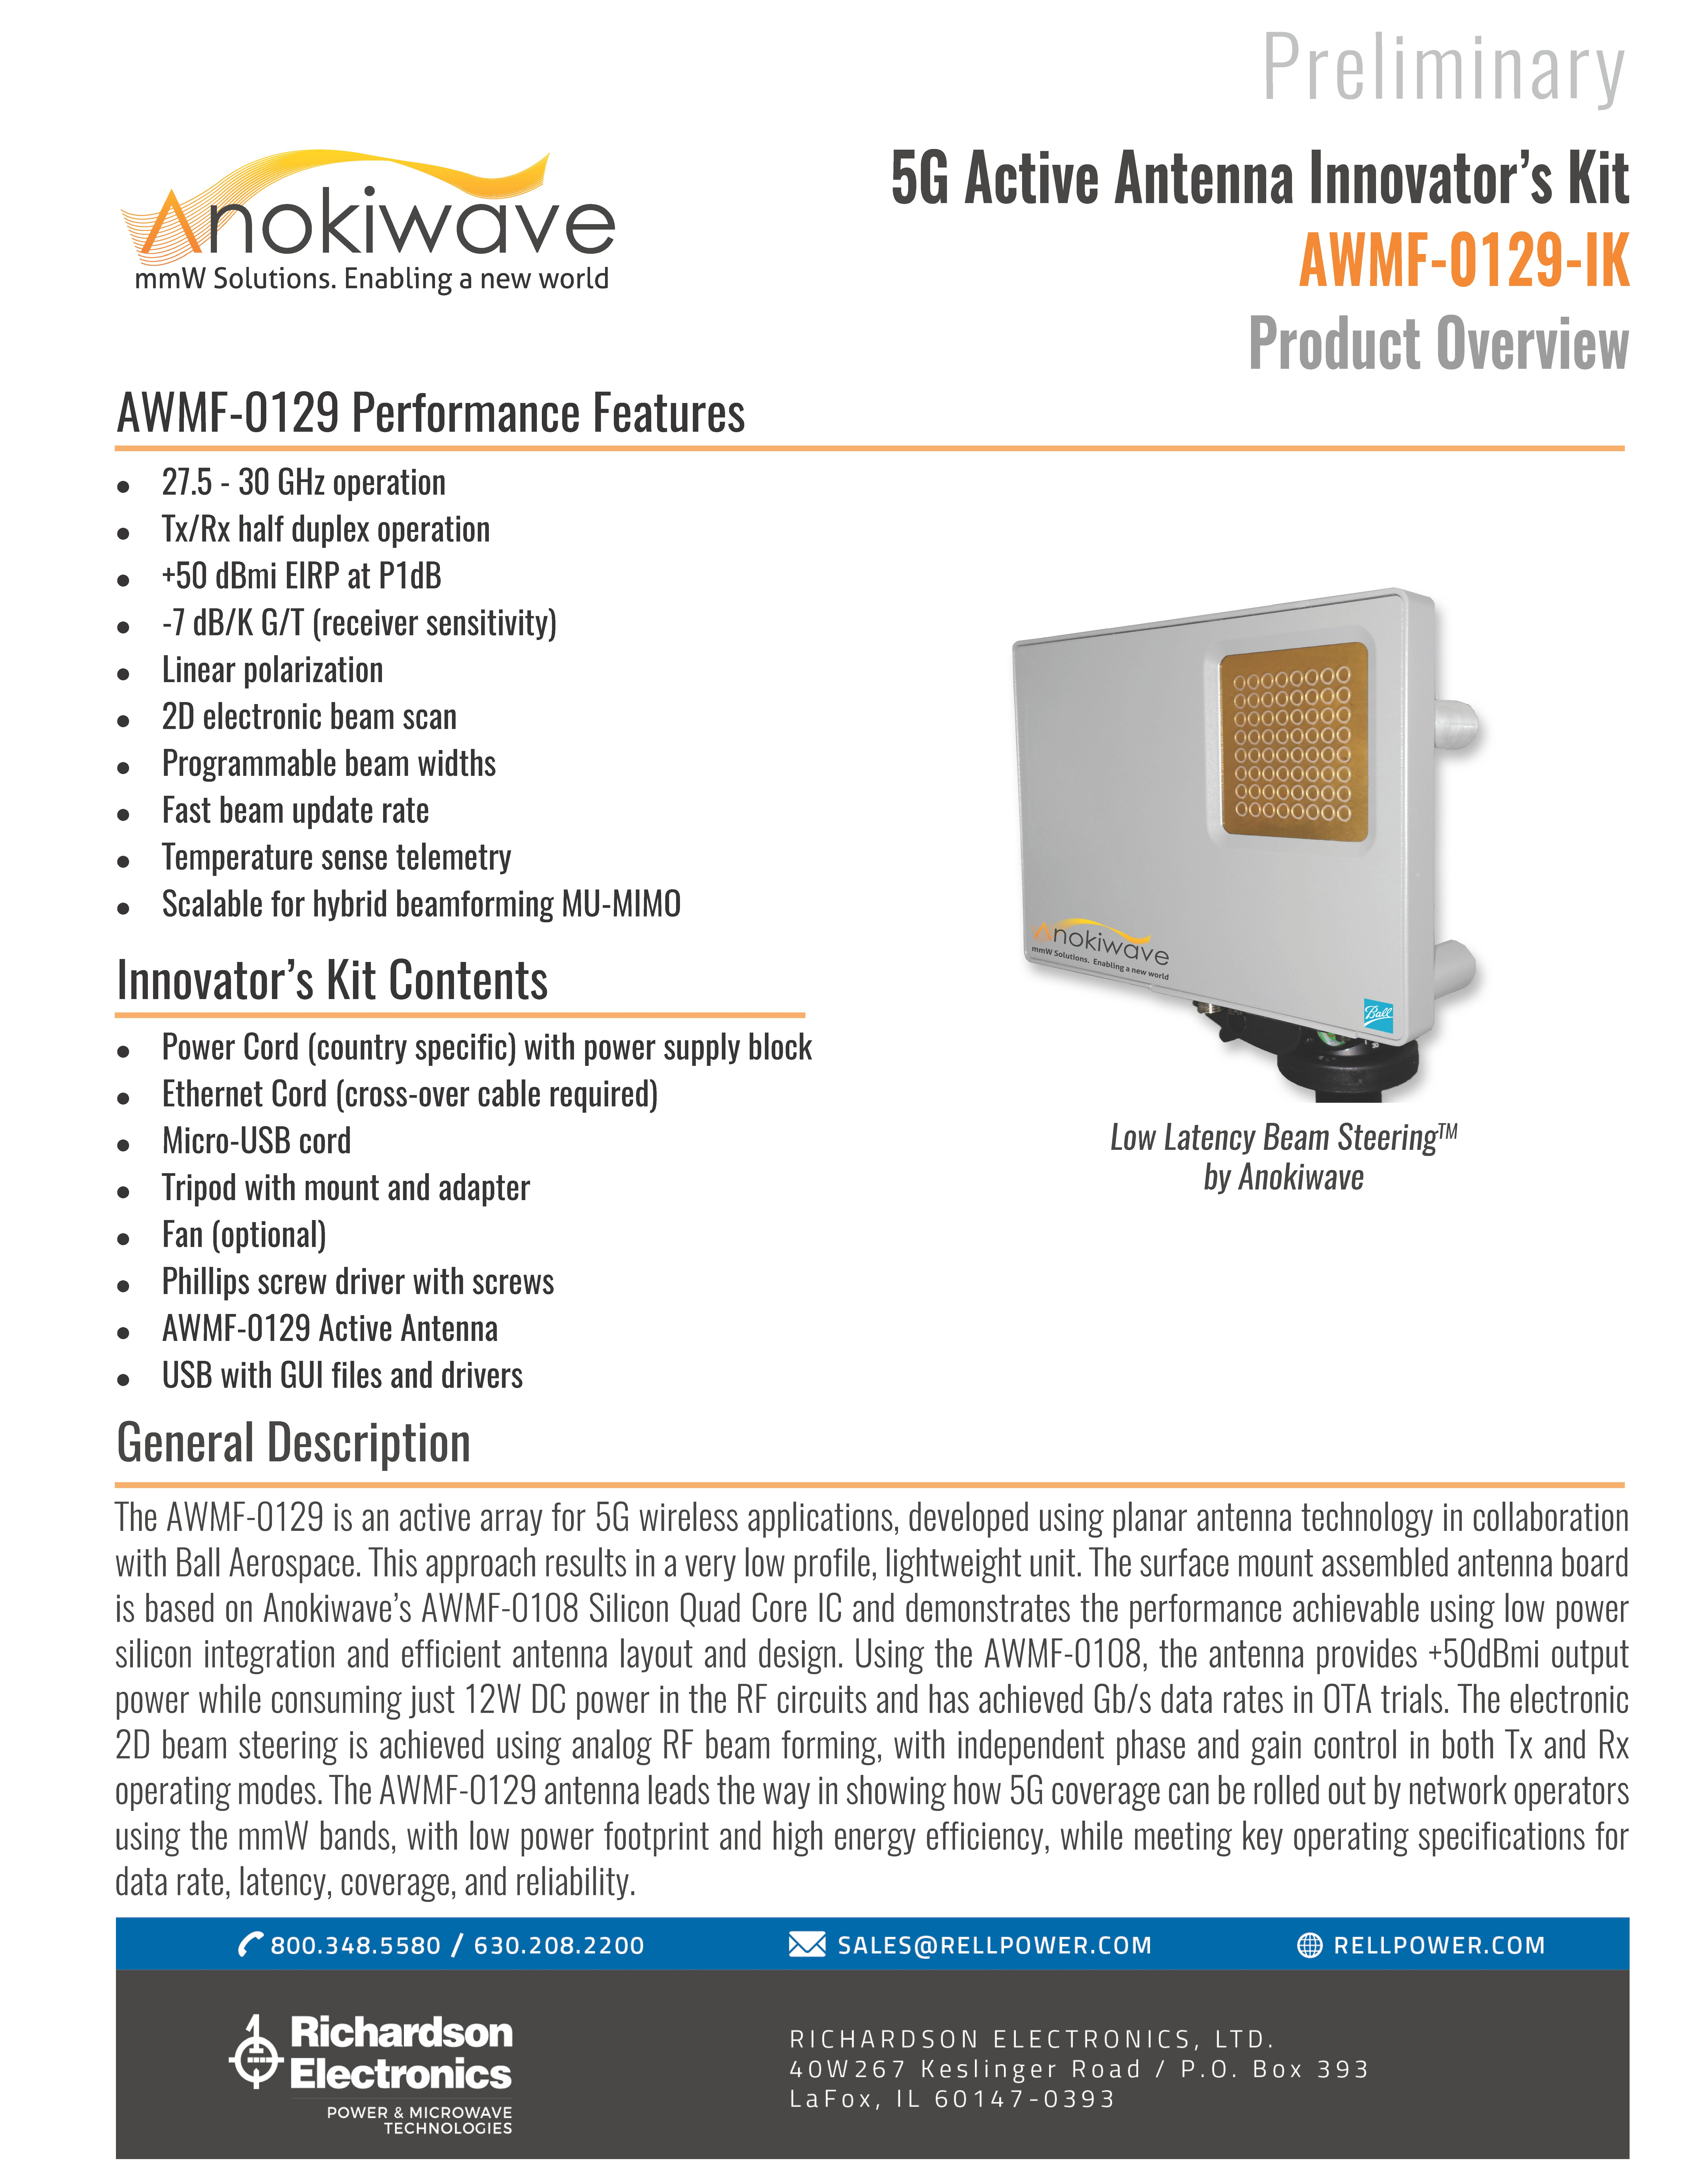 Anokiwave - 5G Active Antenna Innovator's Kit - AWMF-0129-K - RELL Power